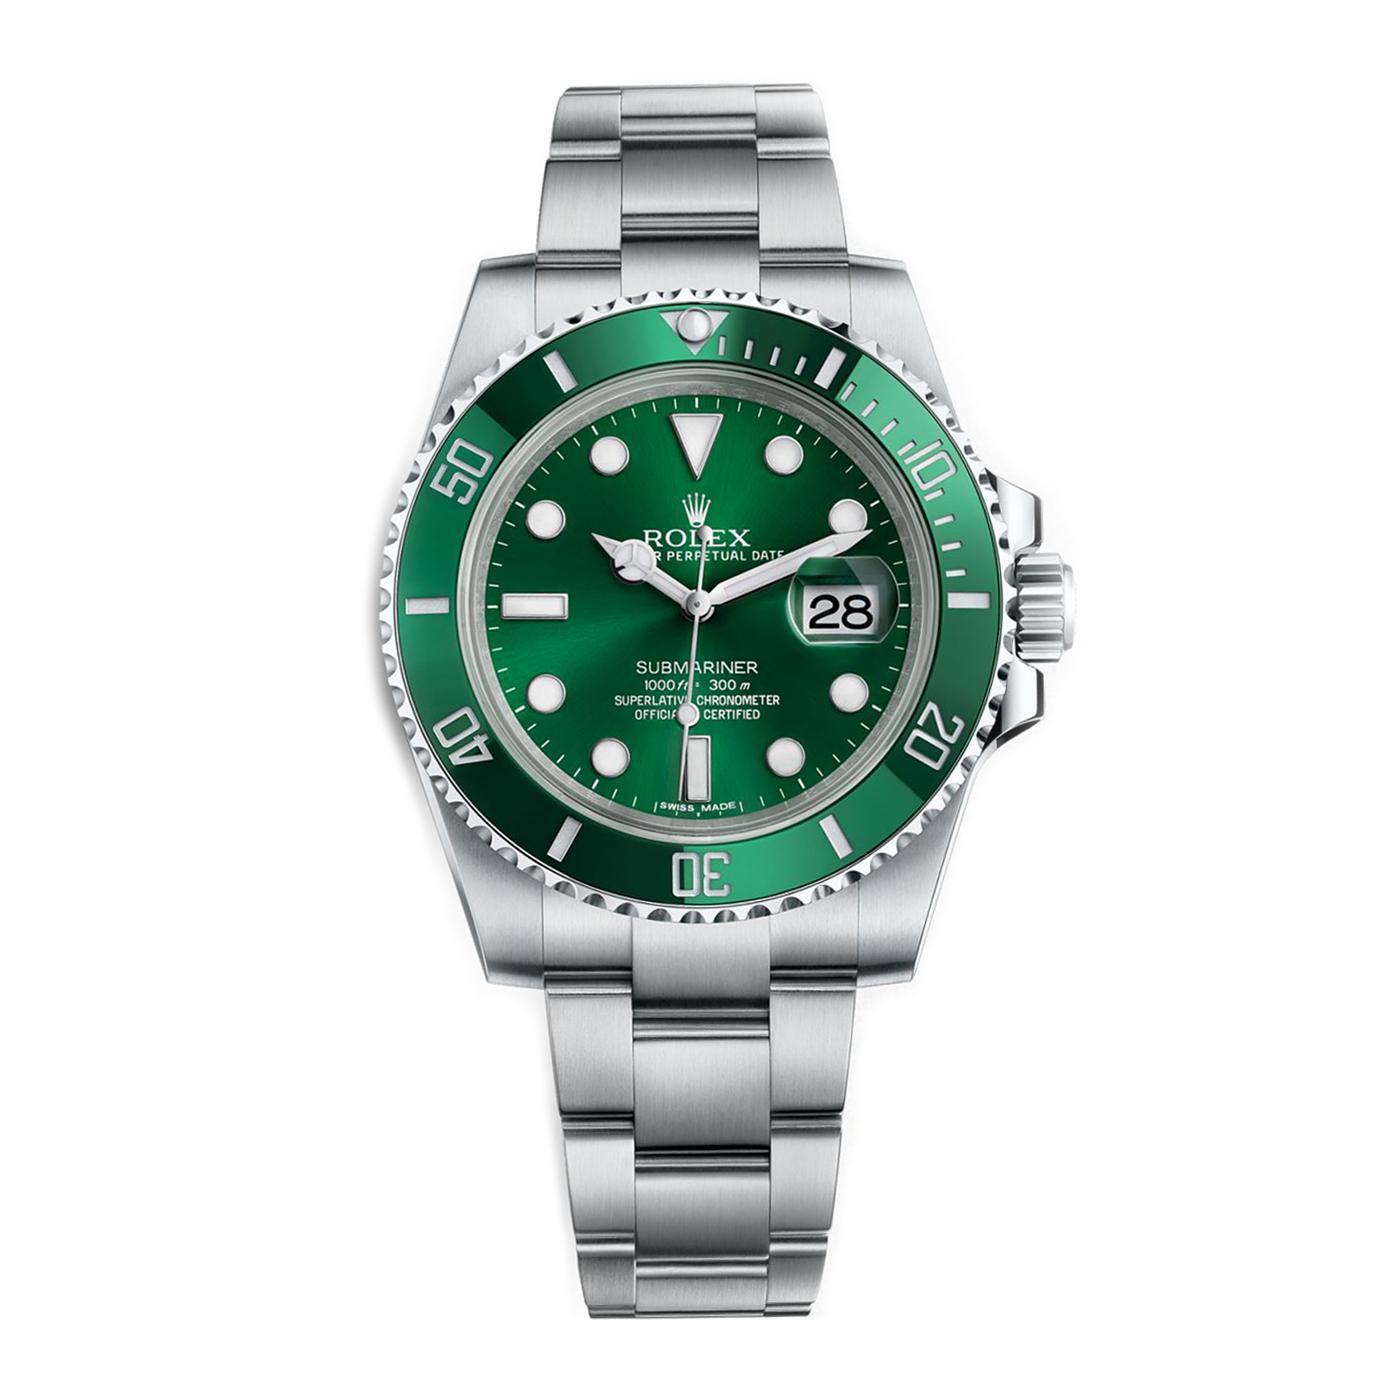 Rolex Submariner Steel Green Dial (Hulk) 116610LV 3135 ETA SAAT